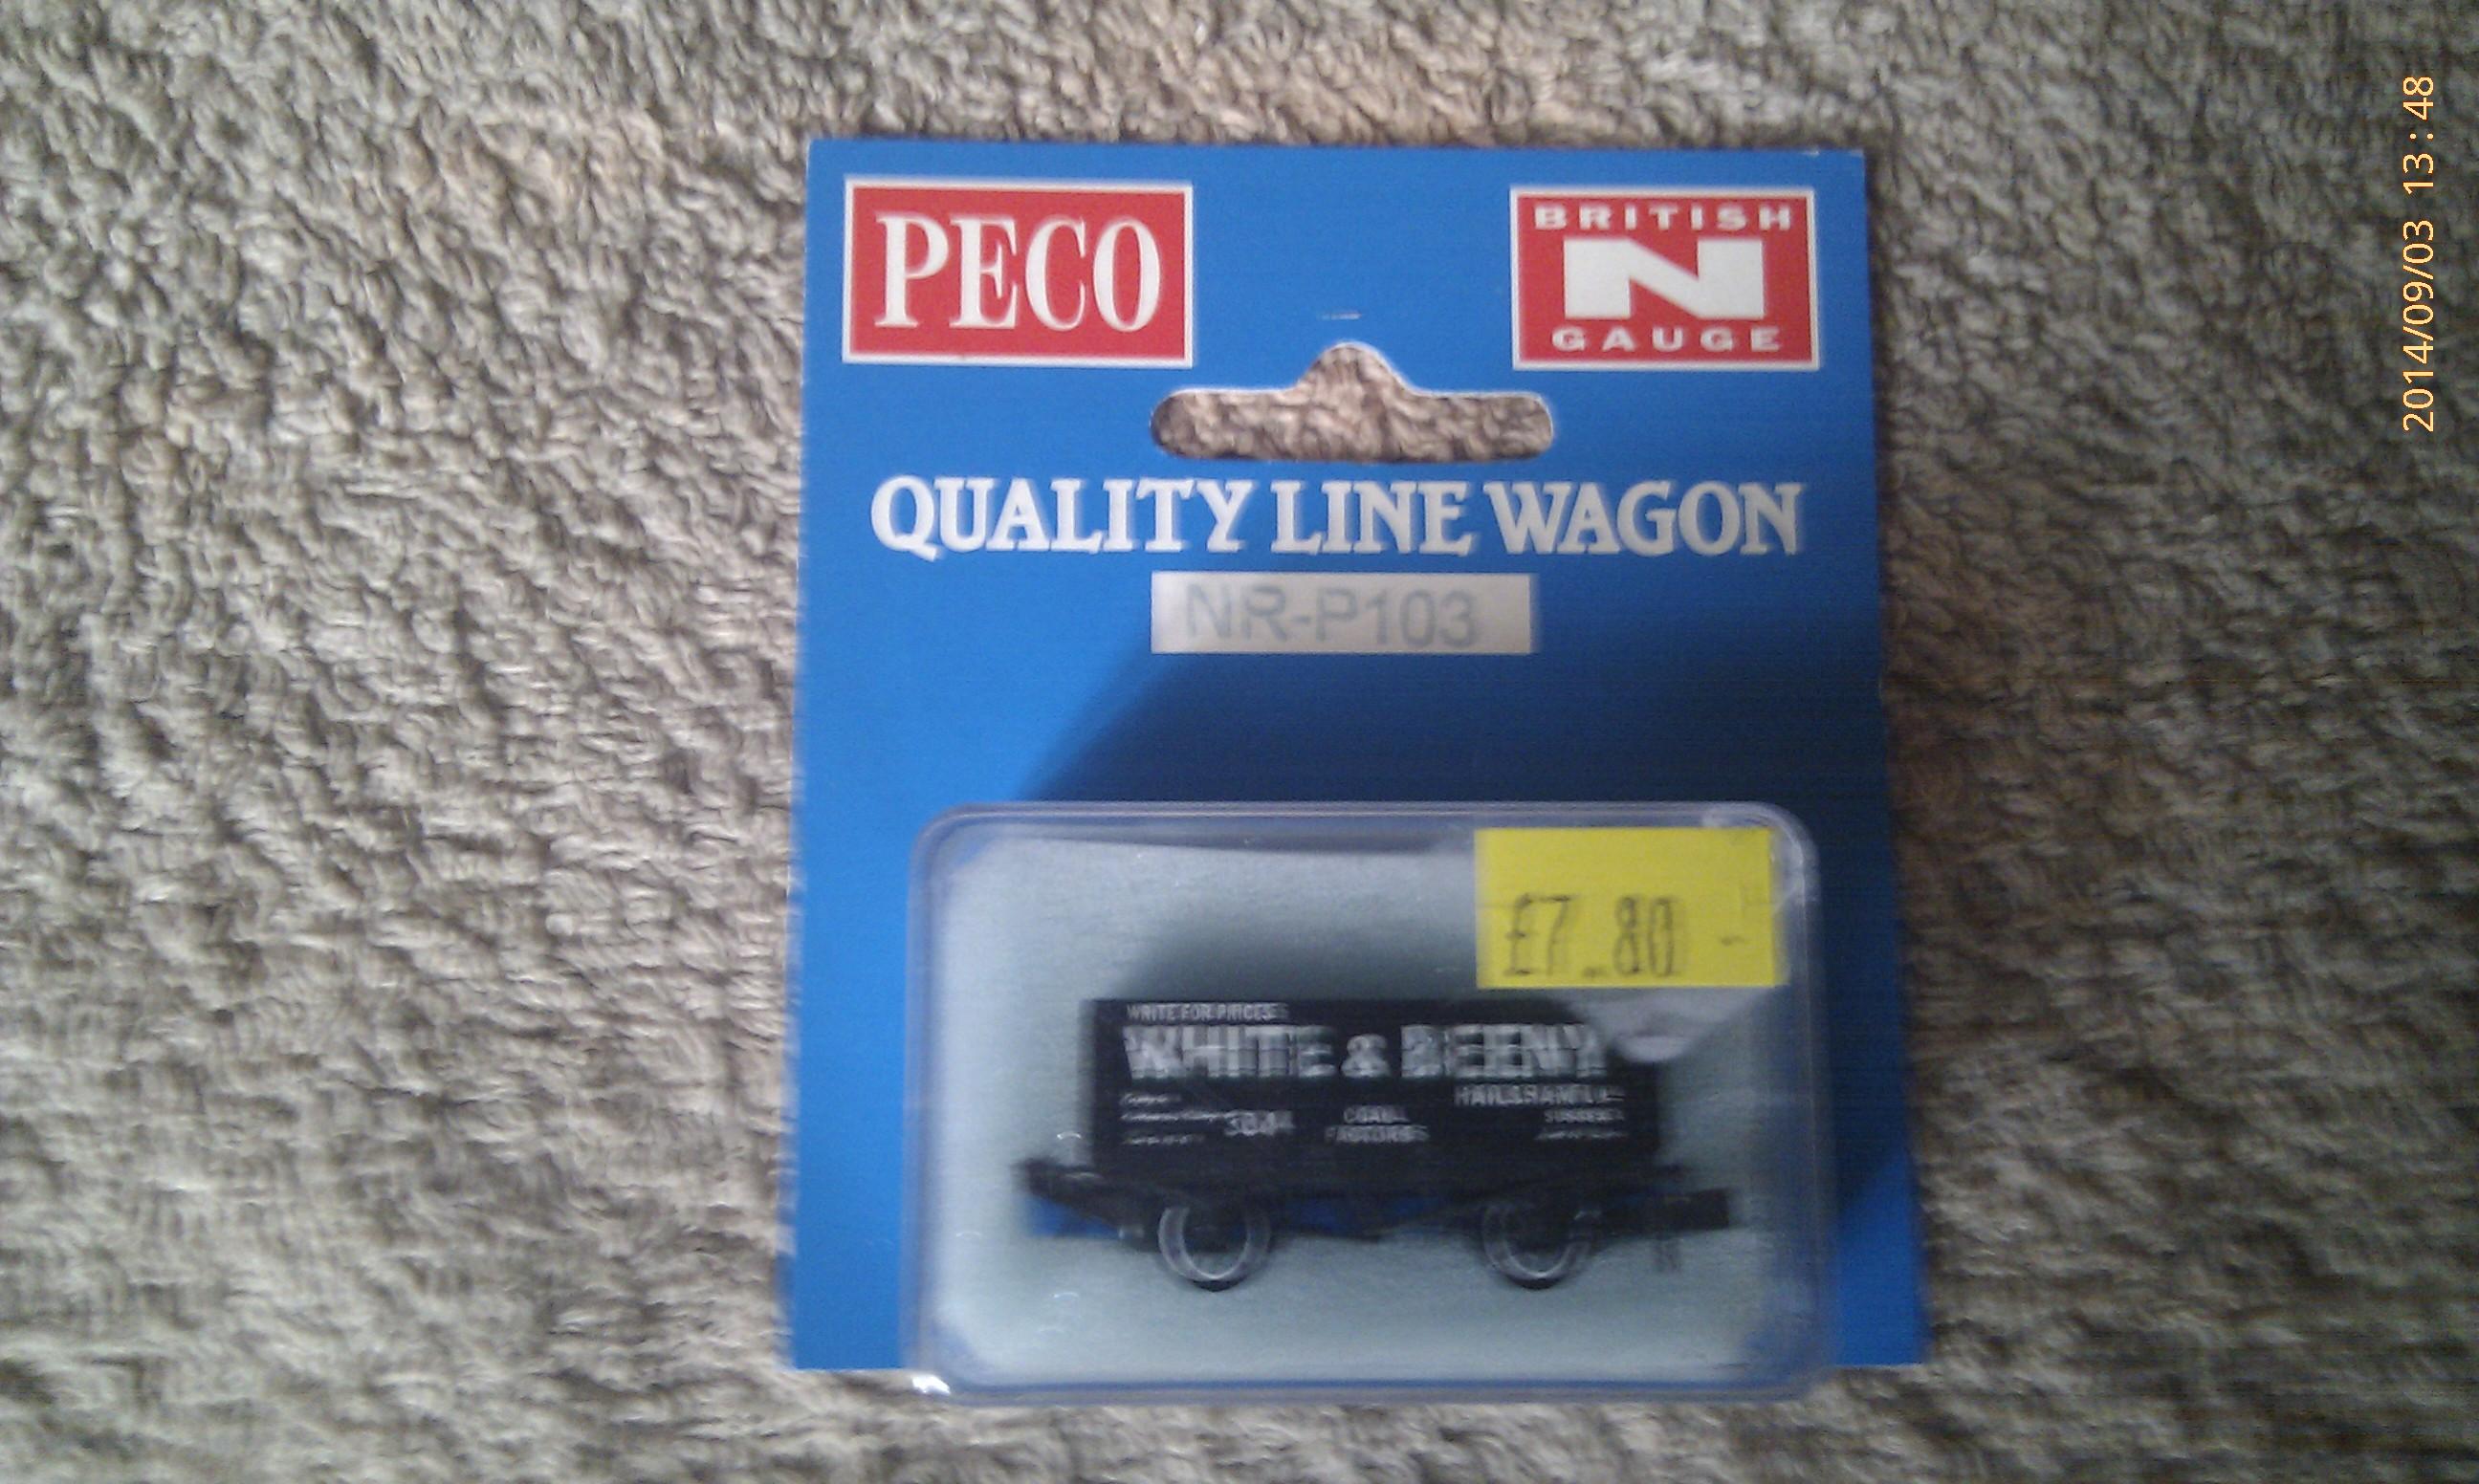 Peco Quality Line Wagon NR-P103 White & Beeny